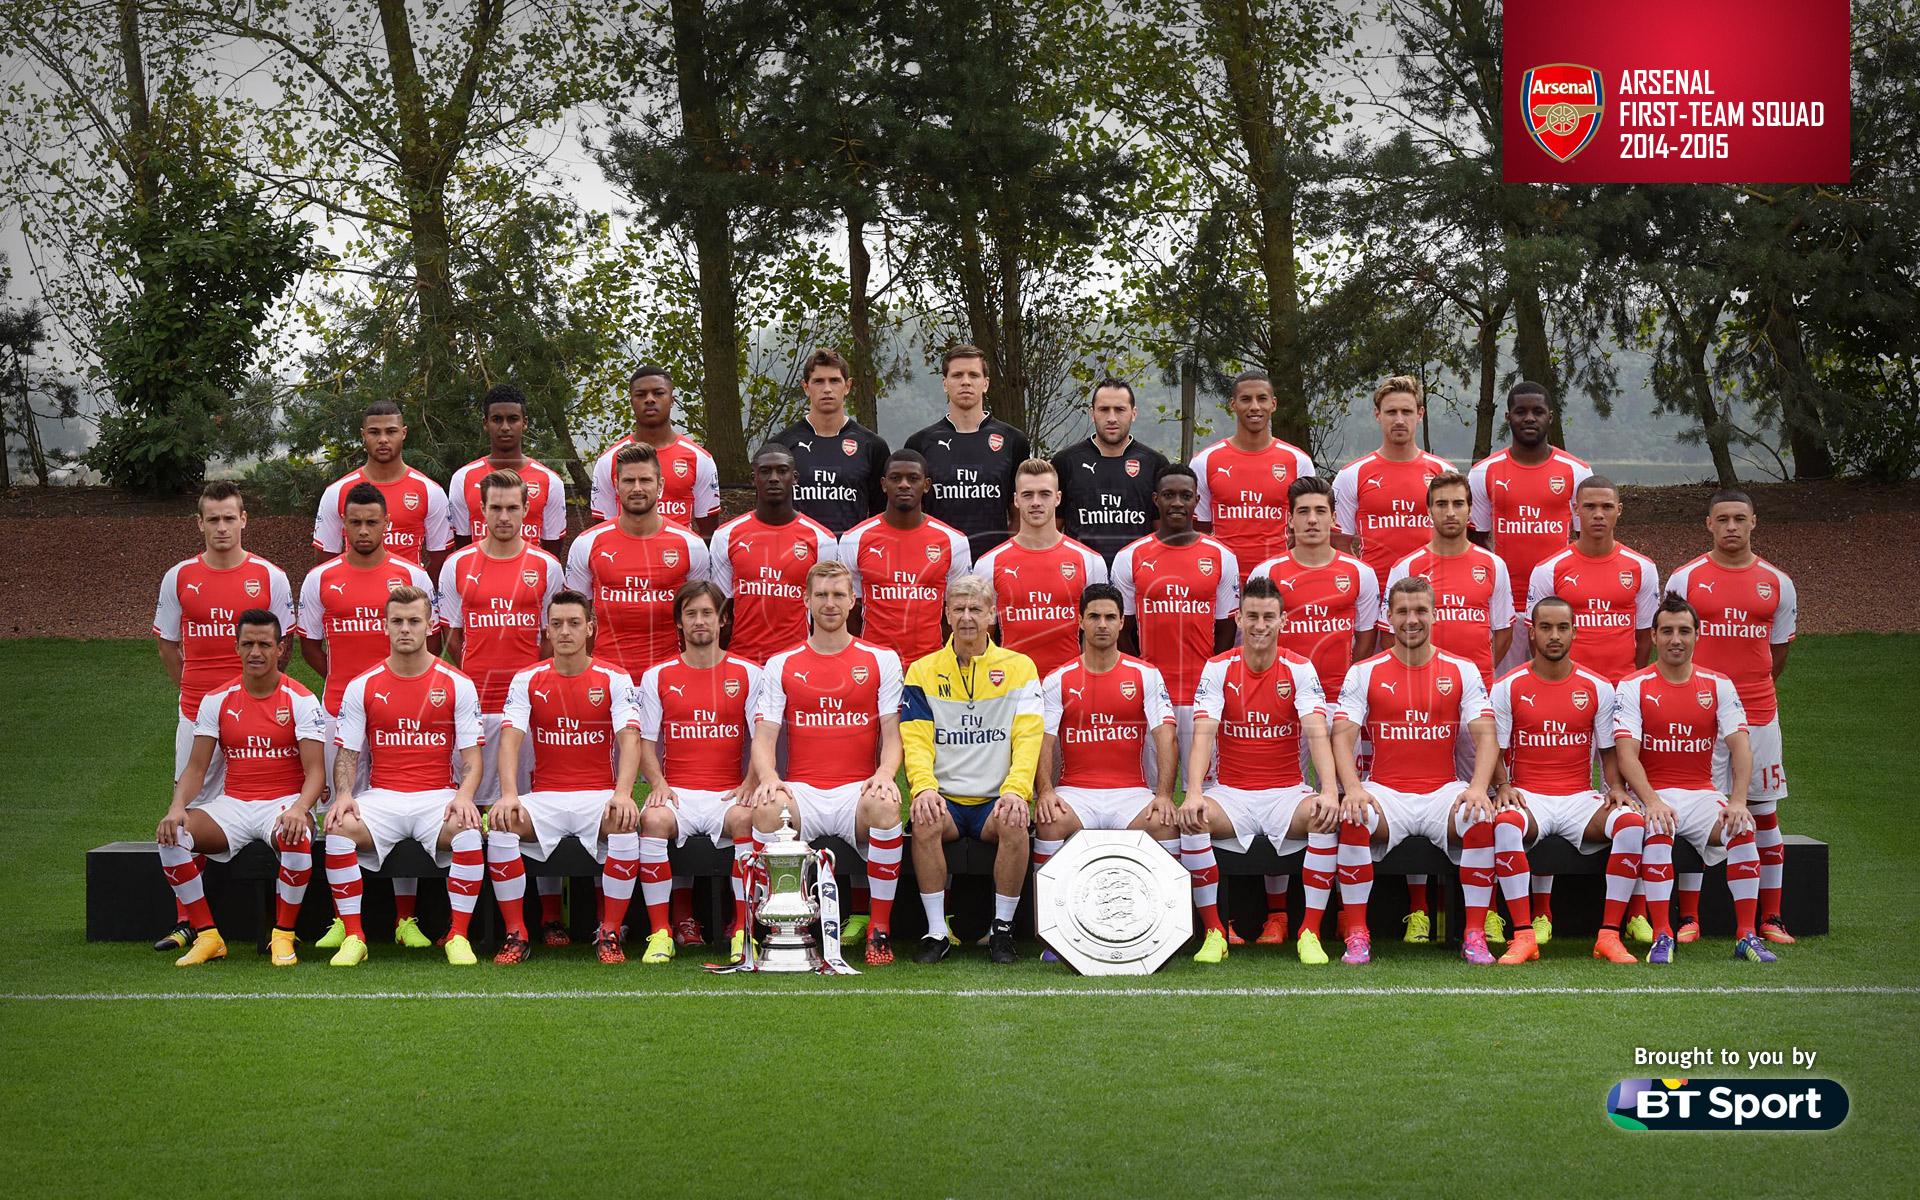 2014 aston villa 0 3 arsenal sep 22 2014 first team squad 2014 2015 1920x1200